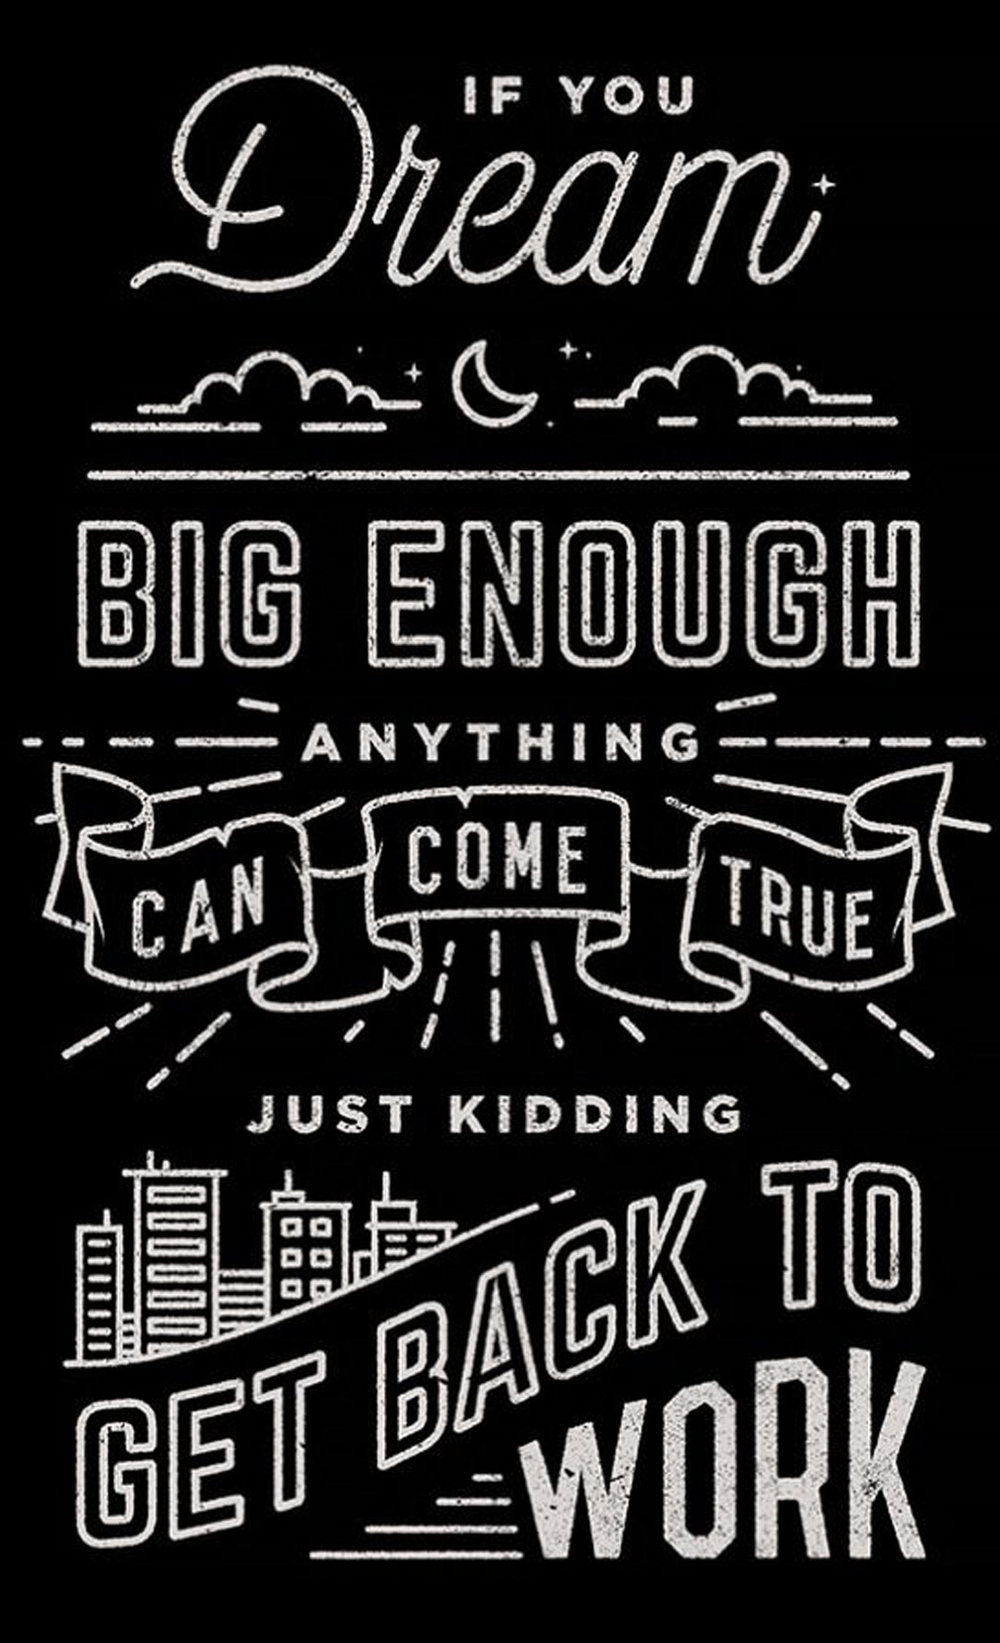 Inspiration // Dream Big Just Kidding // 14x23 // $65